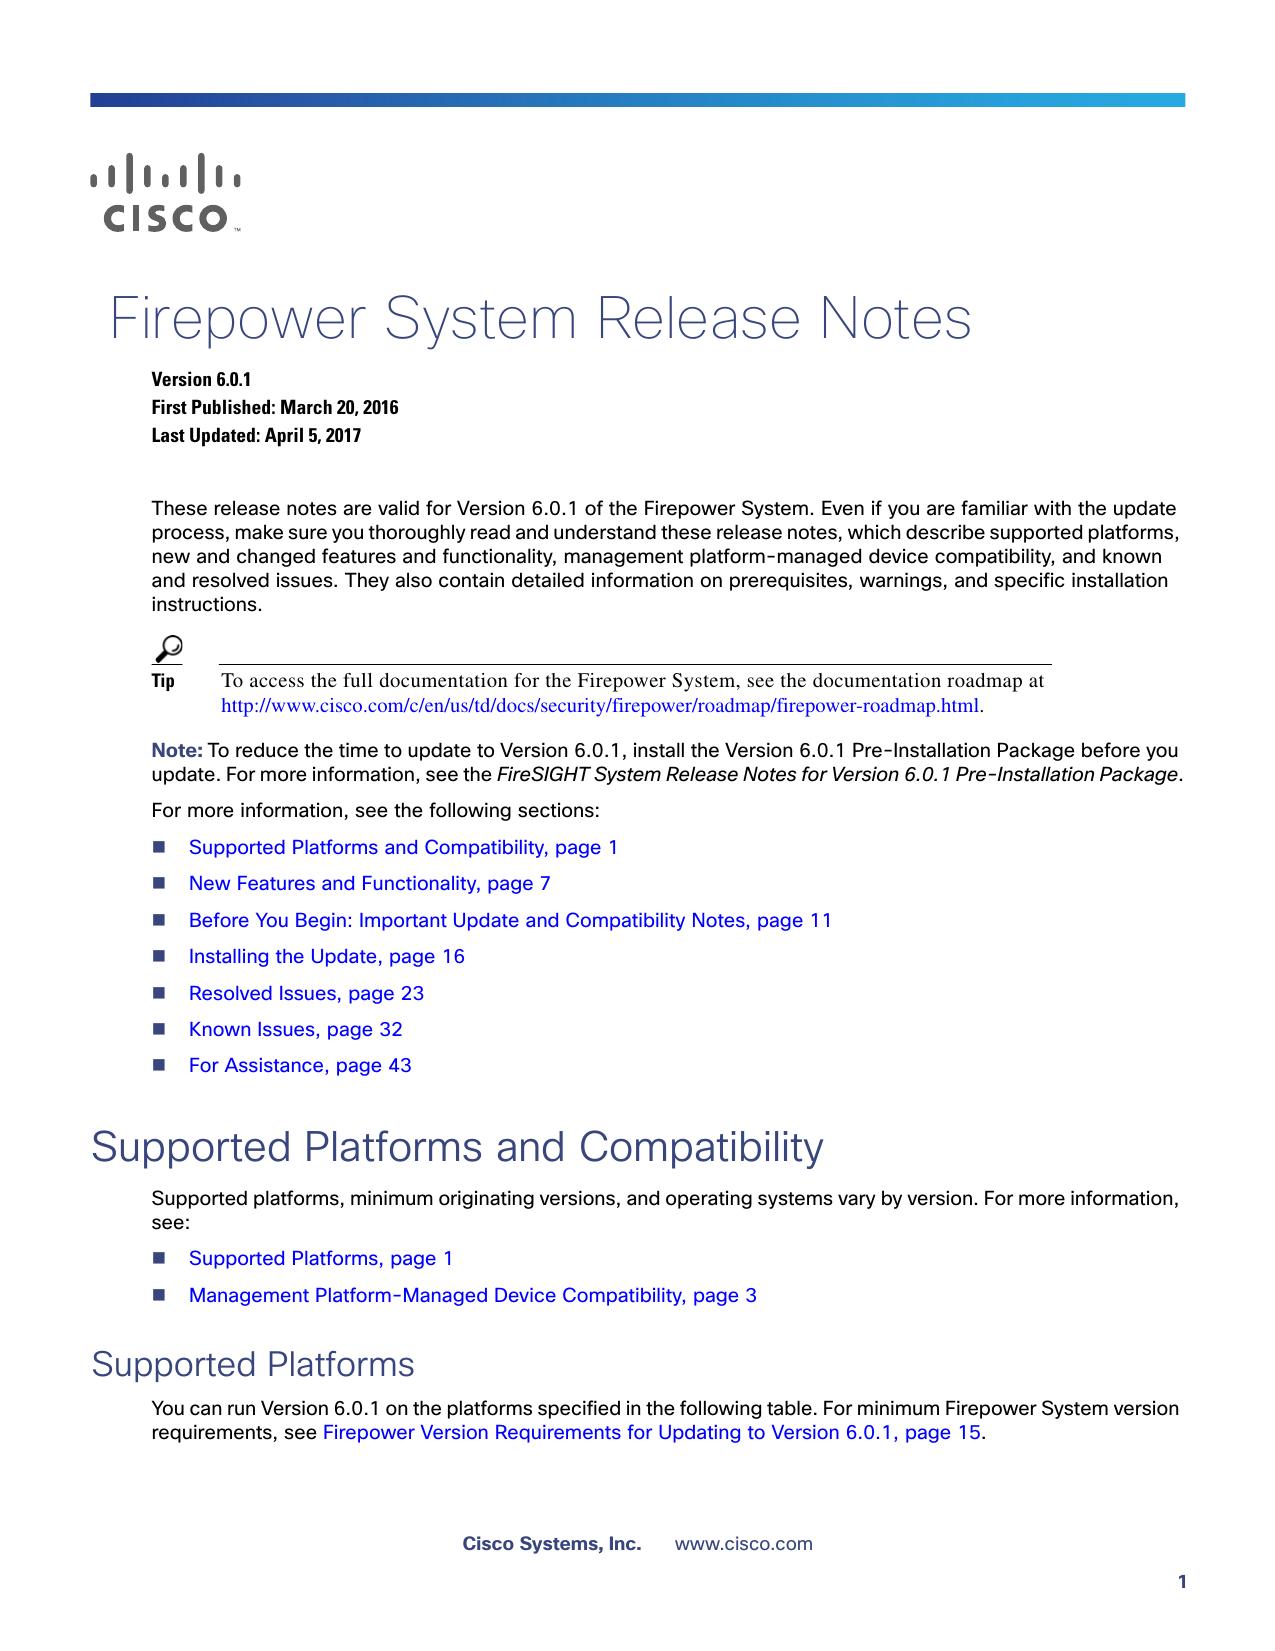 Firepower System Release Notes, Version 6 0 1 | manualzz com